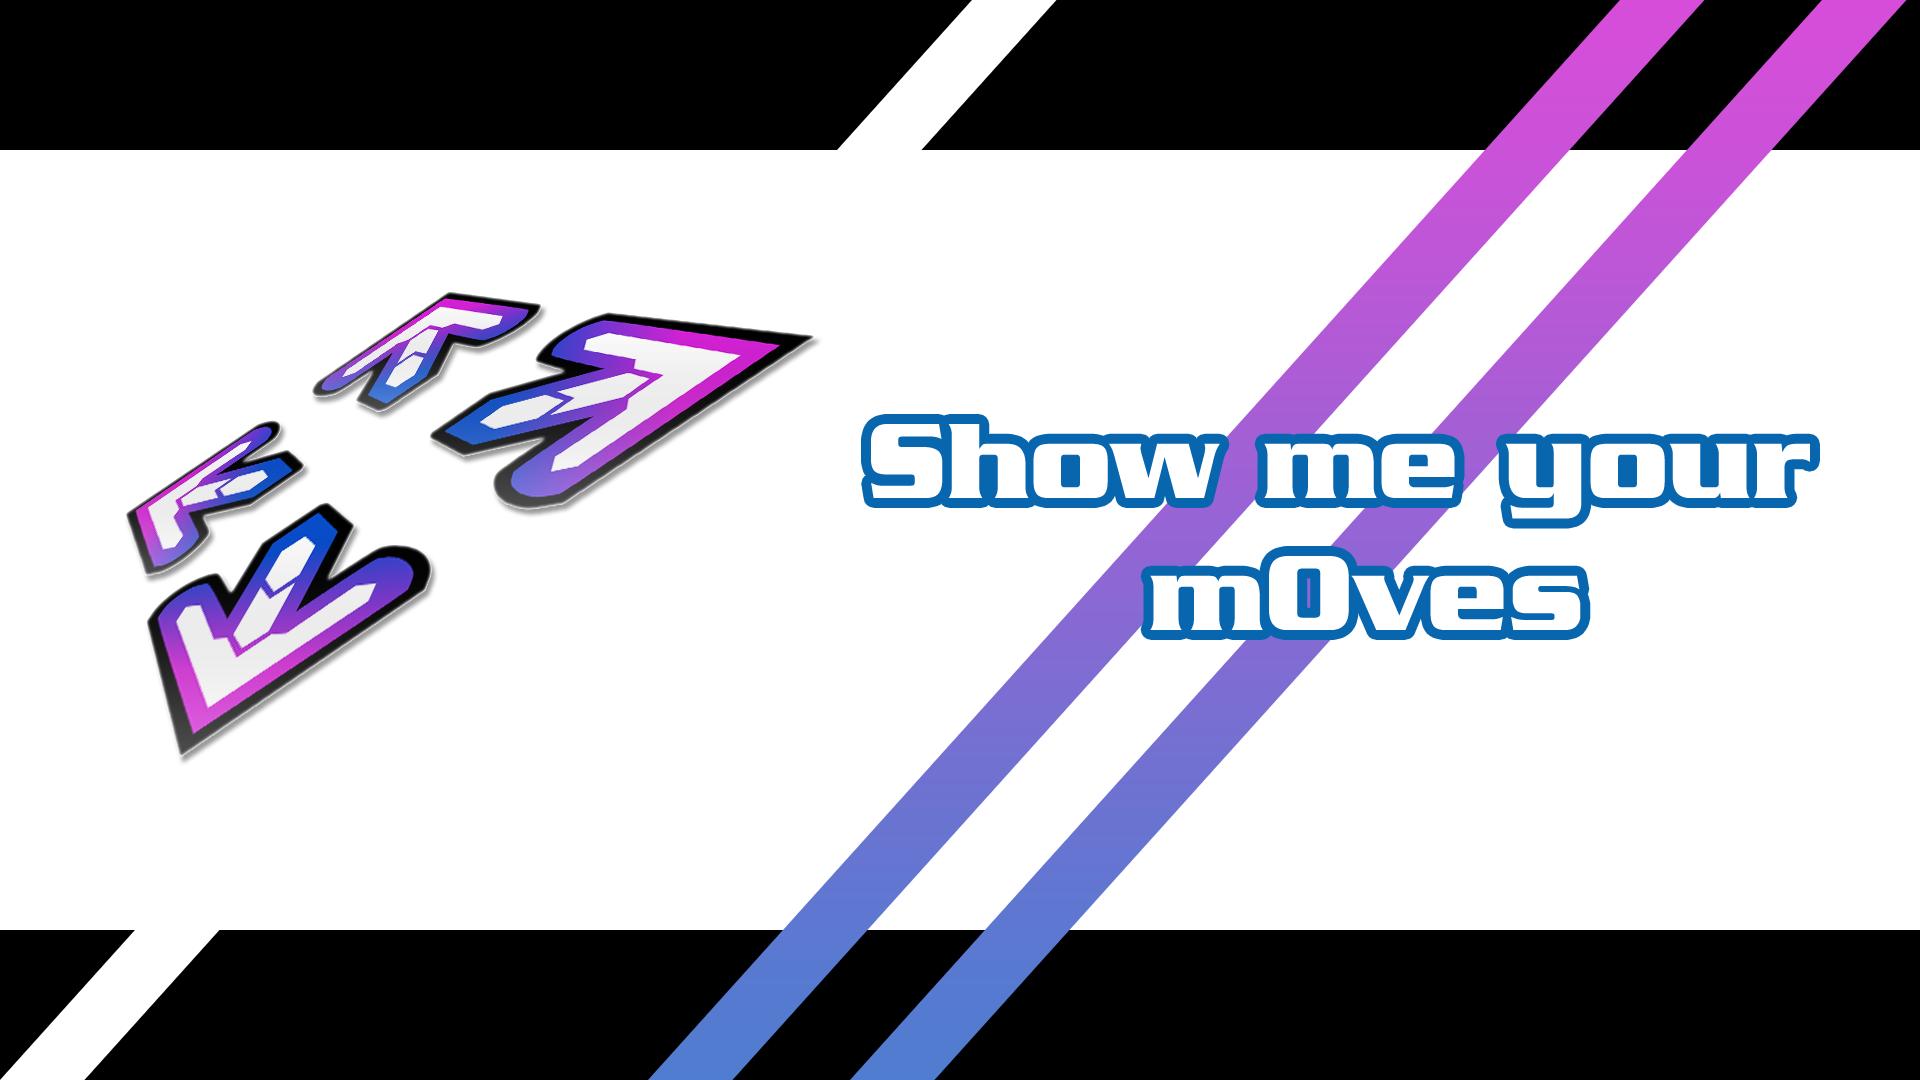 Dance Dance Revolution wallpaper 1920x1080 169 1920x1080